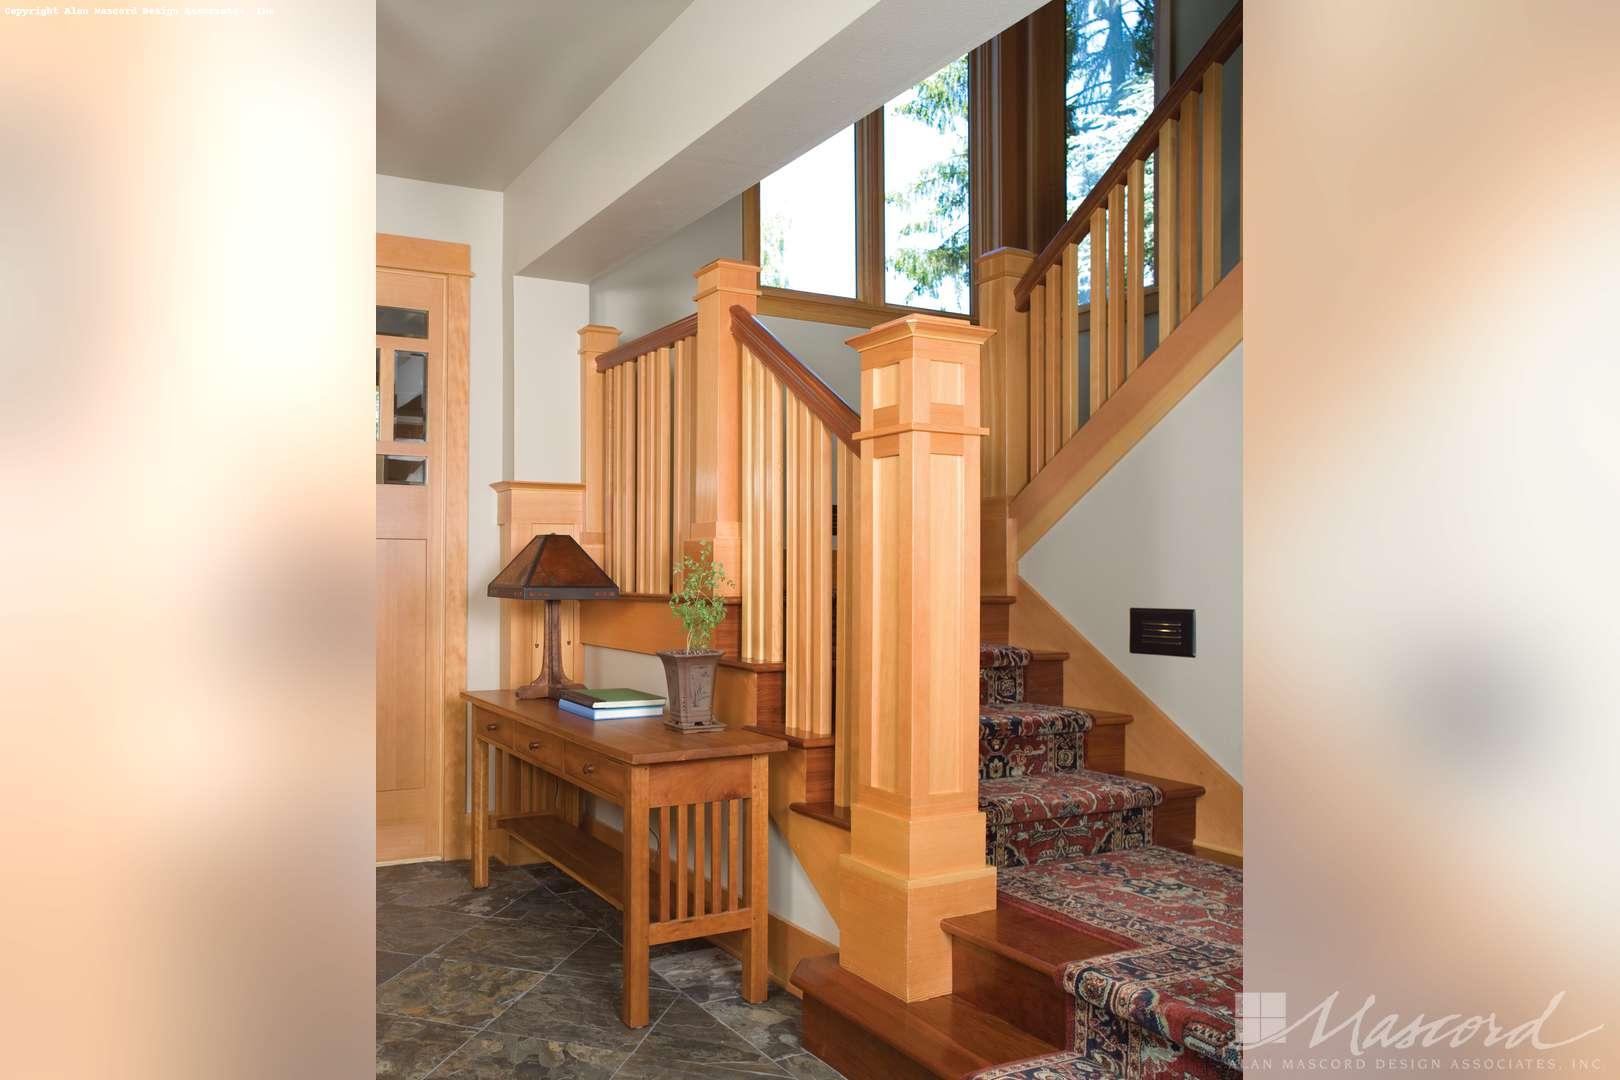 Craftsman House Plan 2447 The Senath 4270 Sqft 4 Beds 3